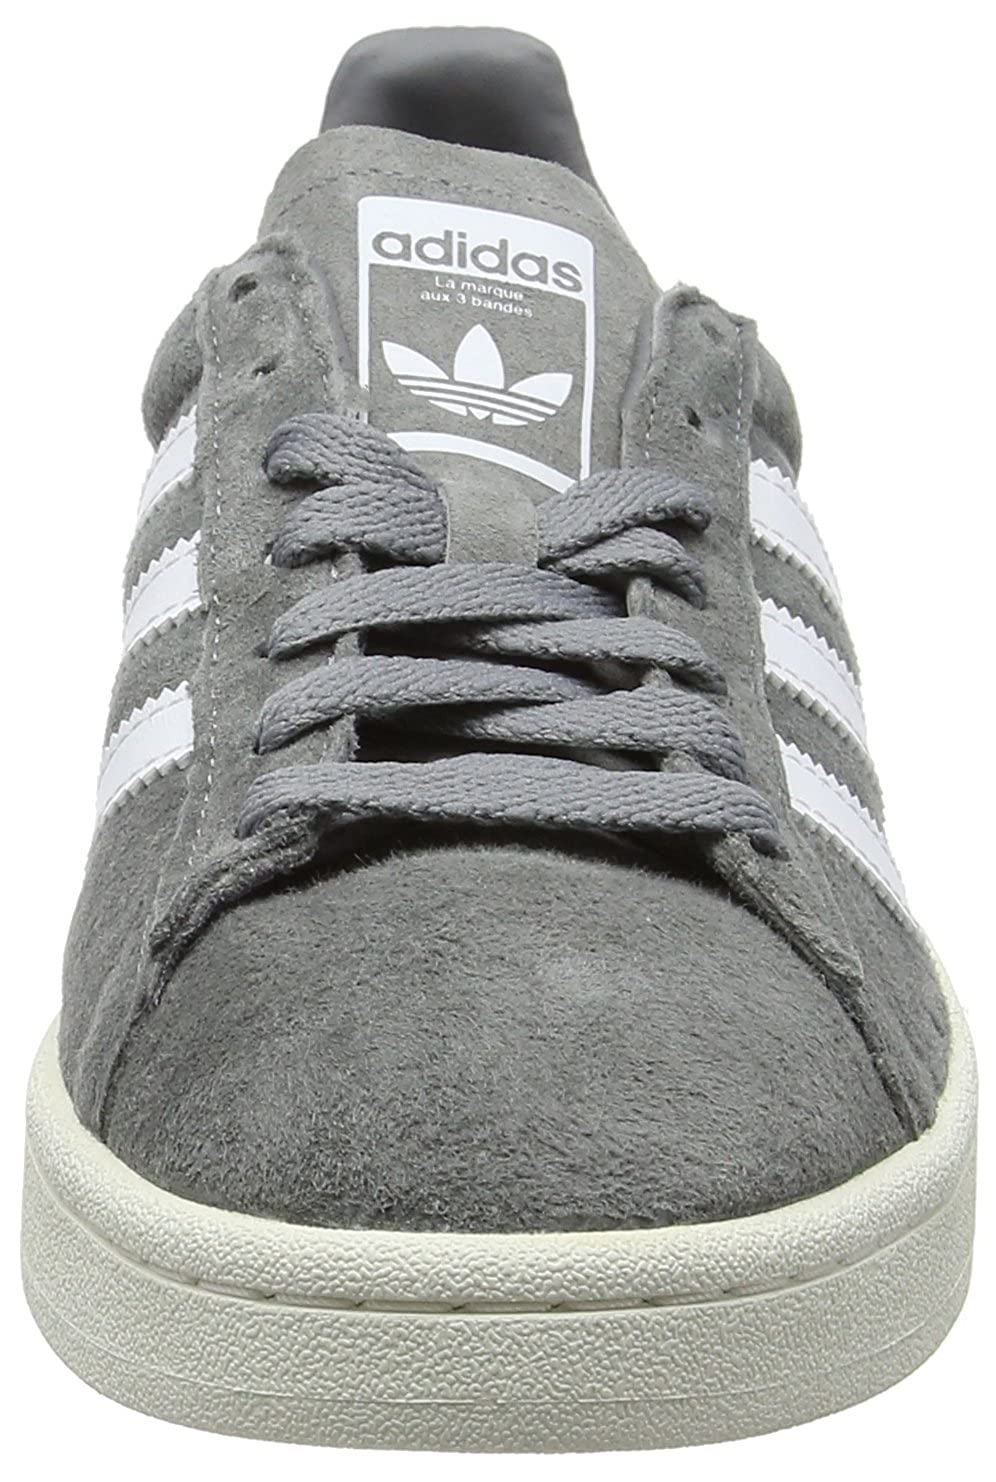 promo code aef6e 835c6 adidas Campus, Baskets Basses Homme Amazon.fr Chaussures et